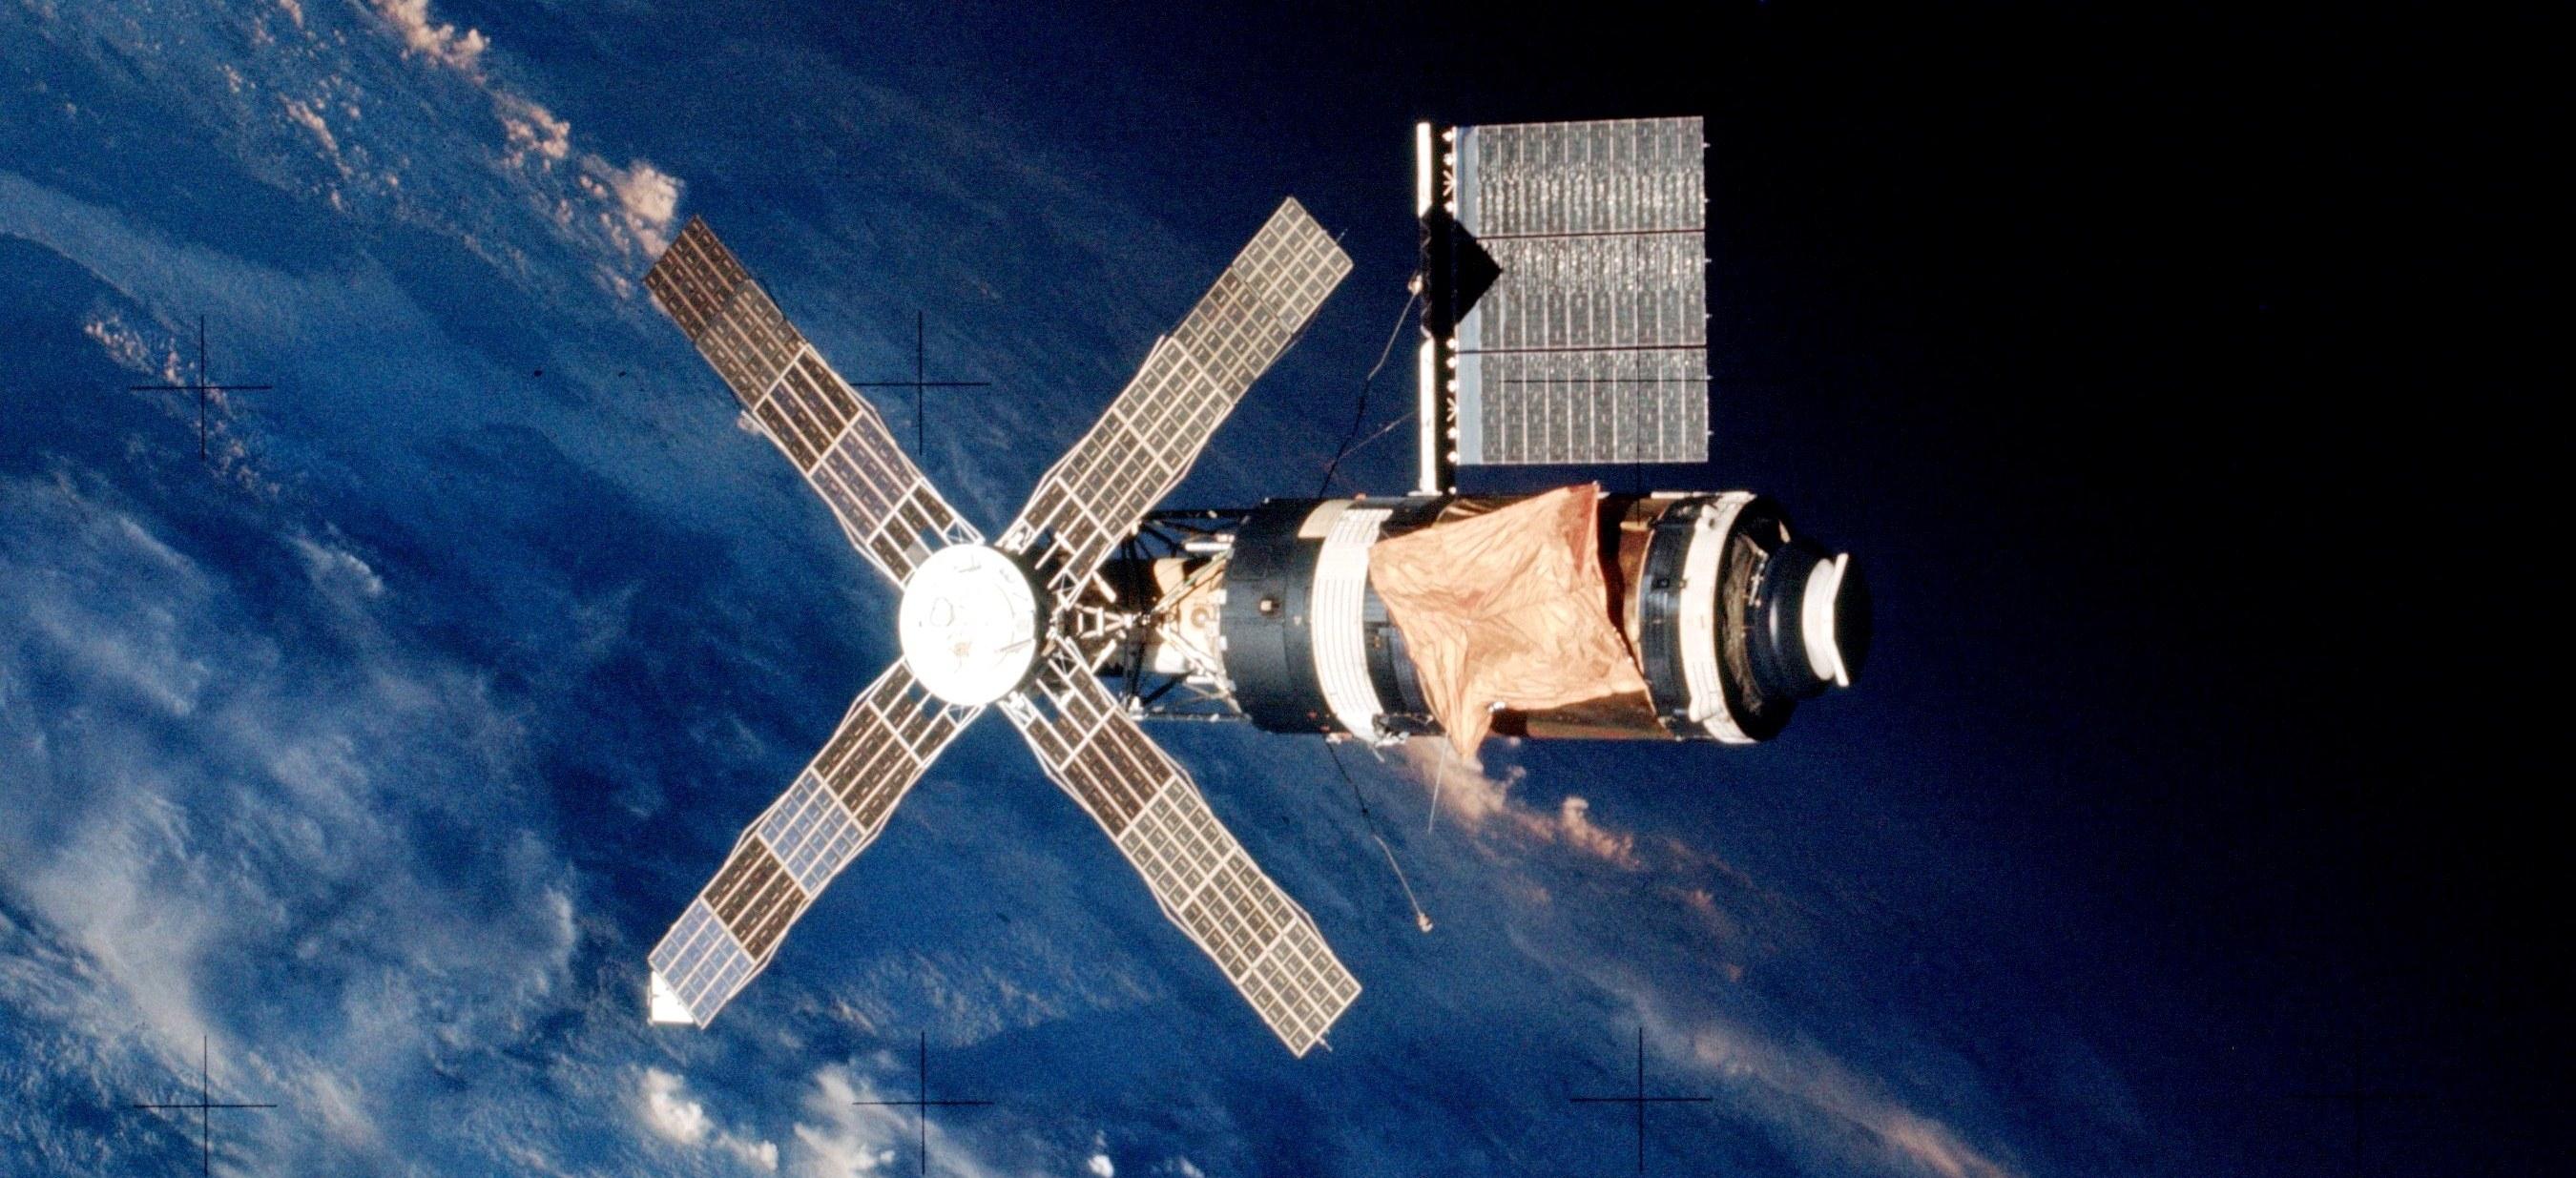 Skylab Space Station Crash - Pics about space